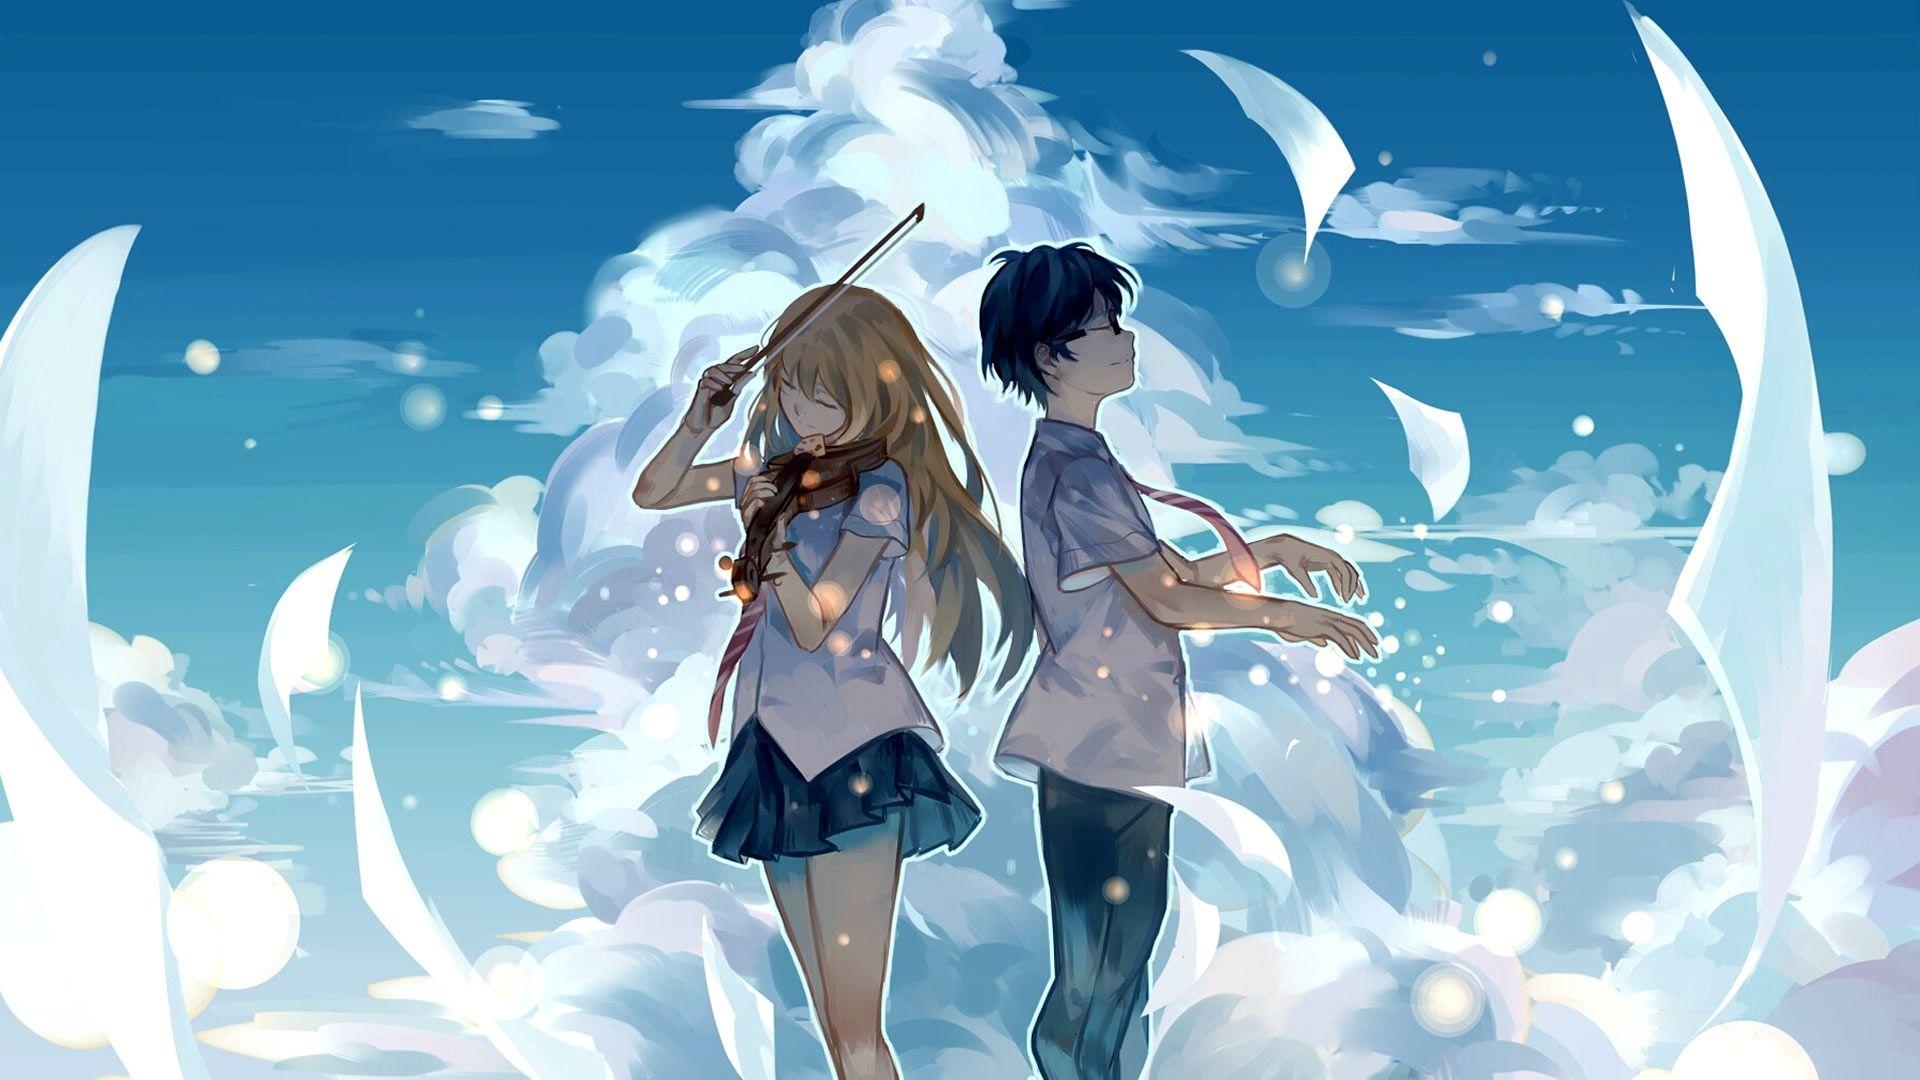 Cute anime wallpaper